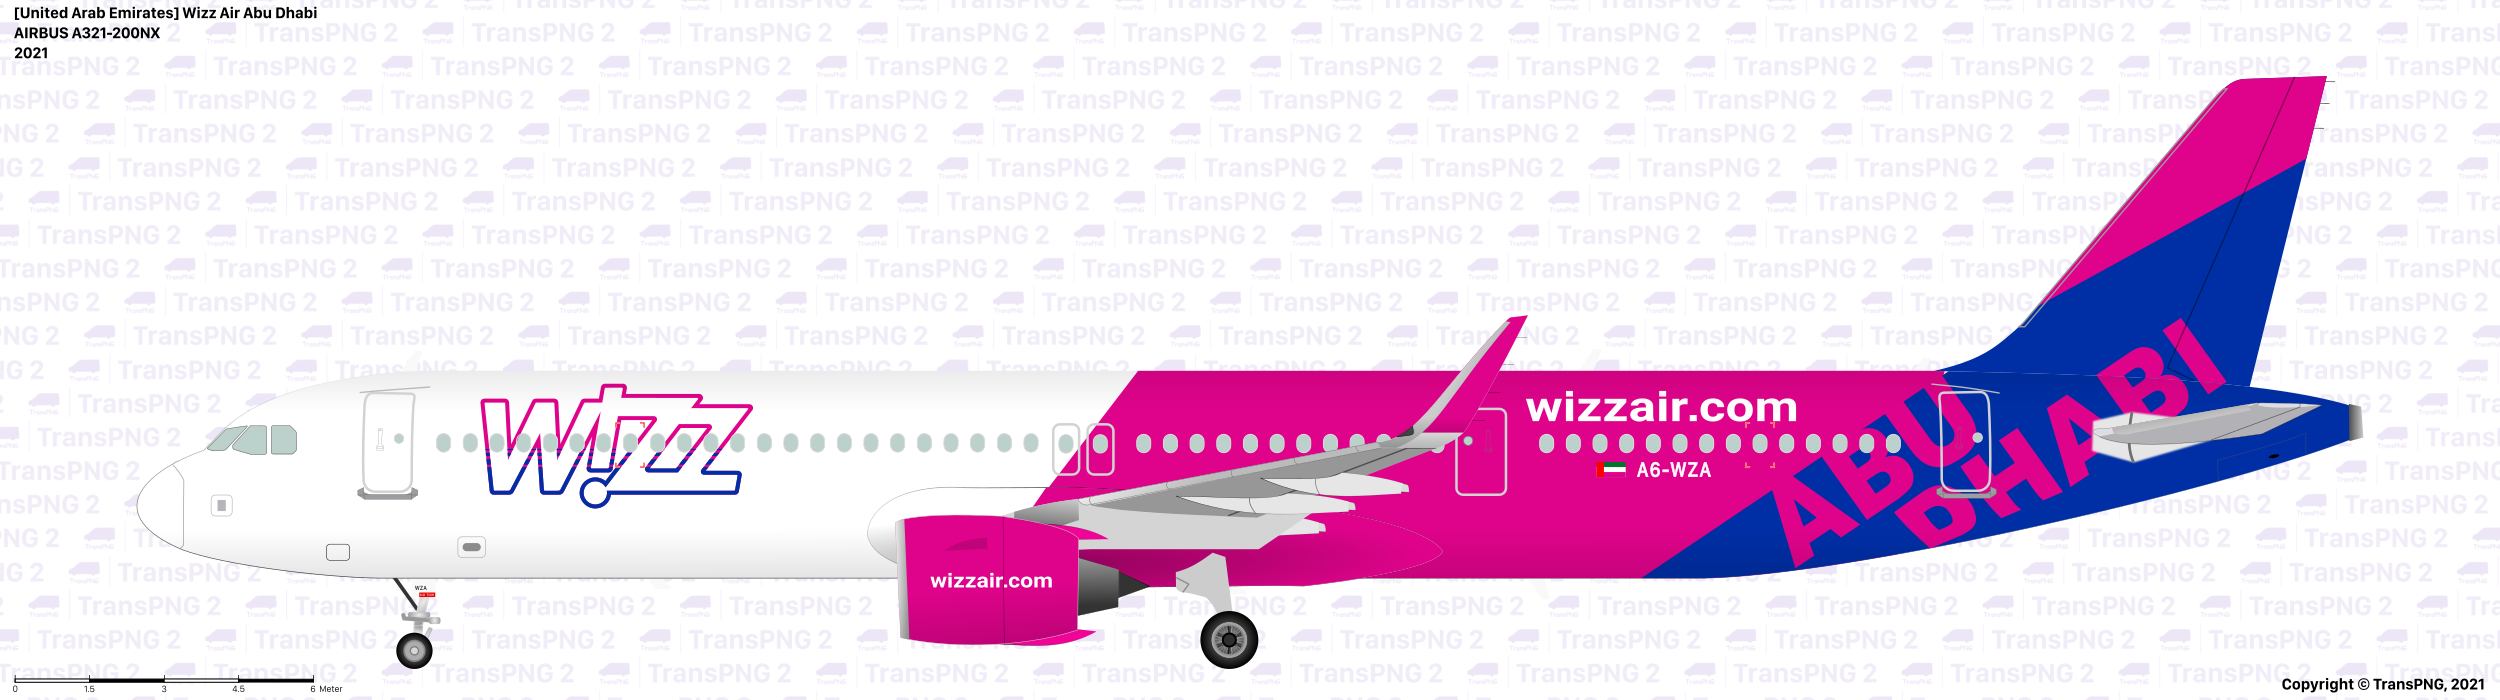 [25138] Wizz Air Abu Dhabi 25138